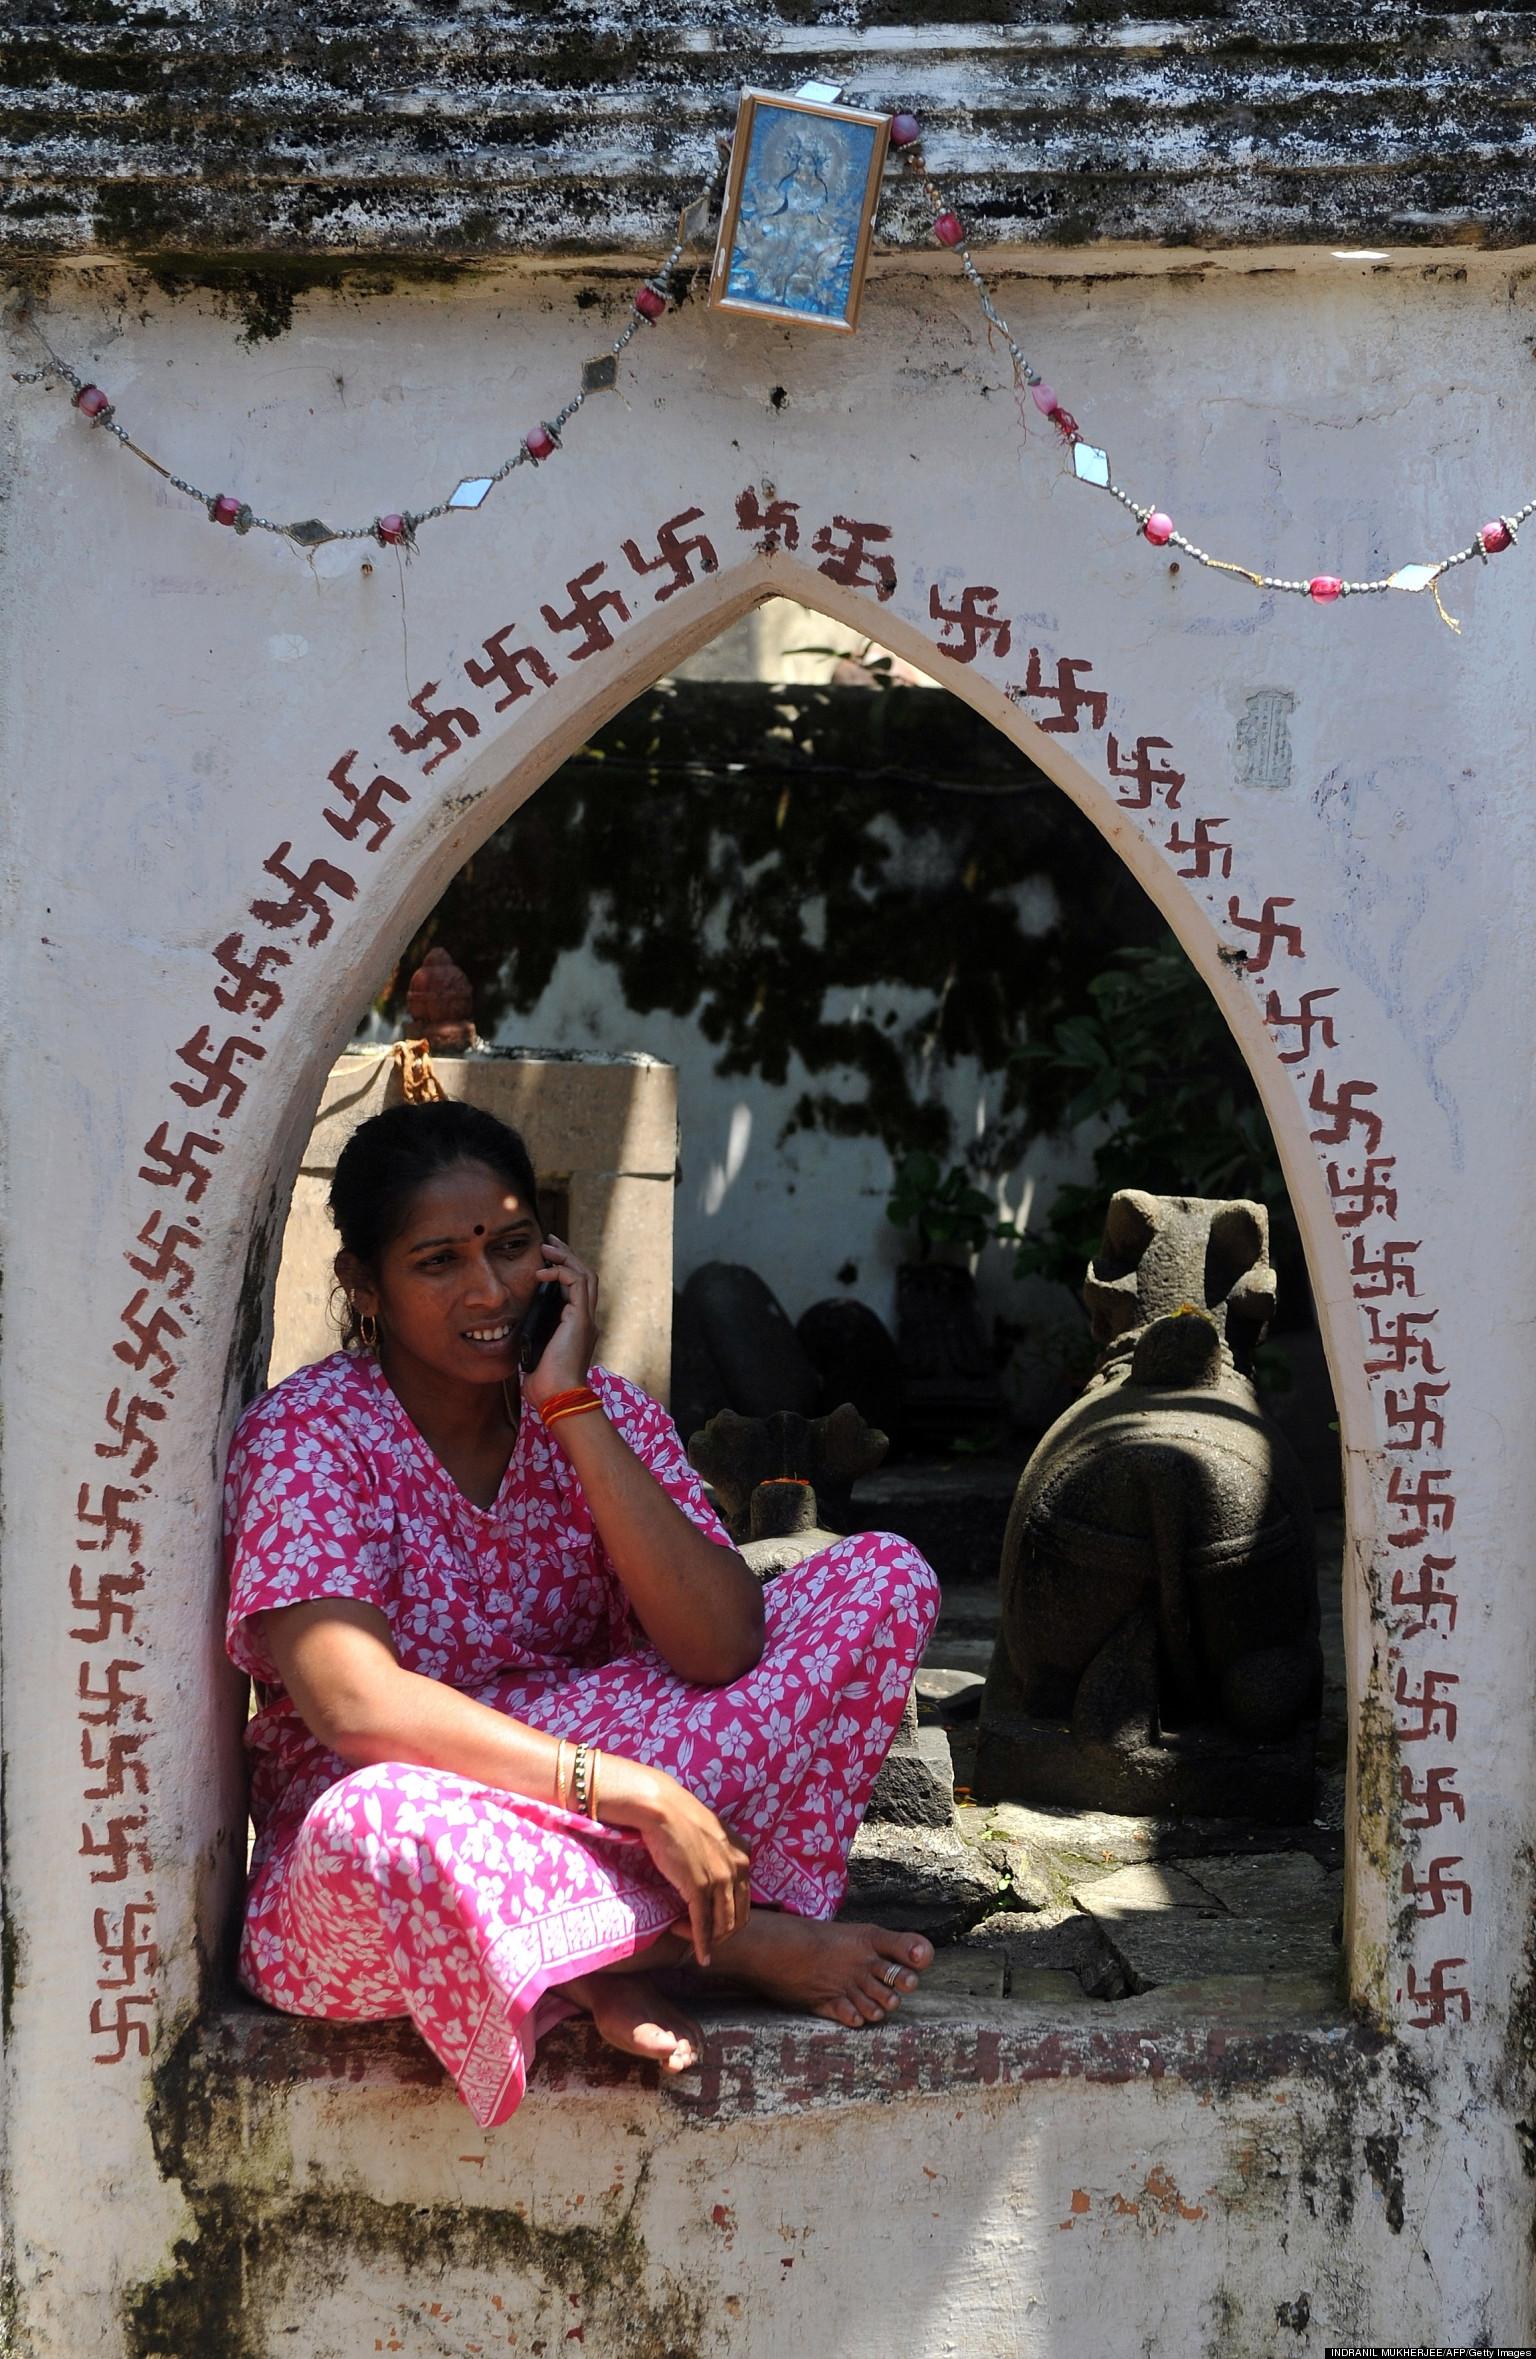 India U0026 39 S Women Cell Phone Ban  Sunderbari Village Bars